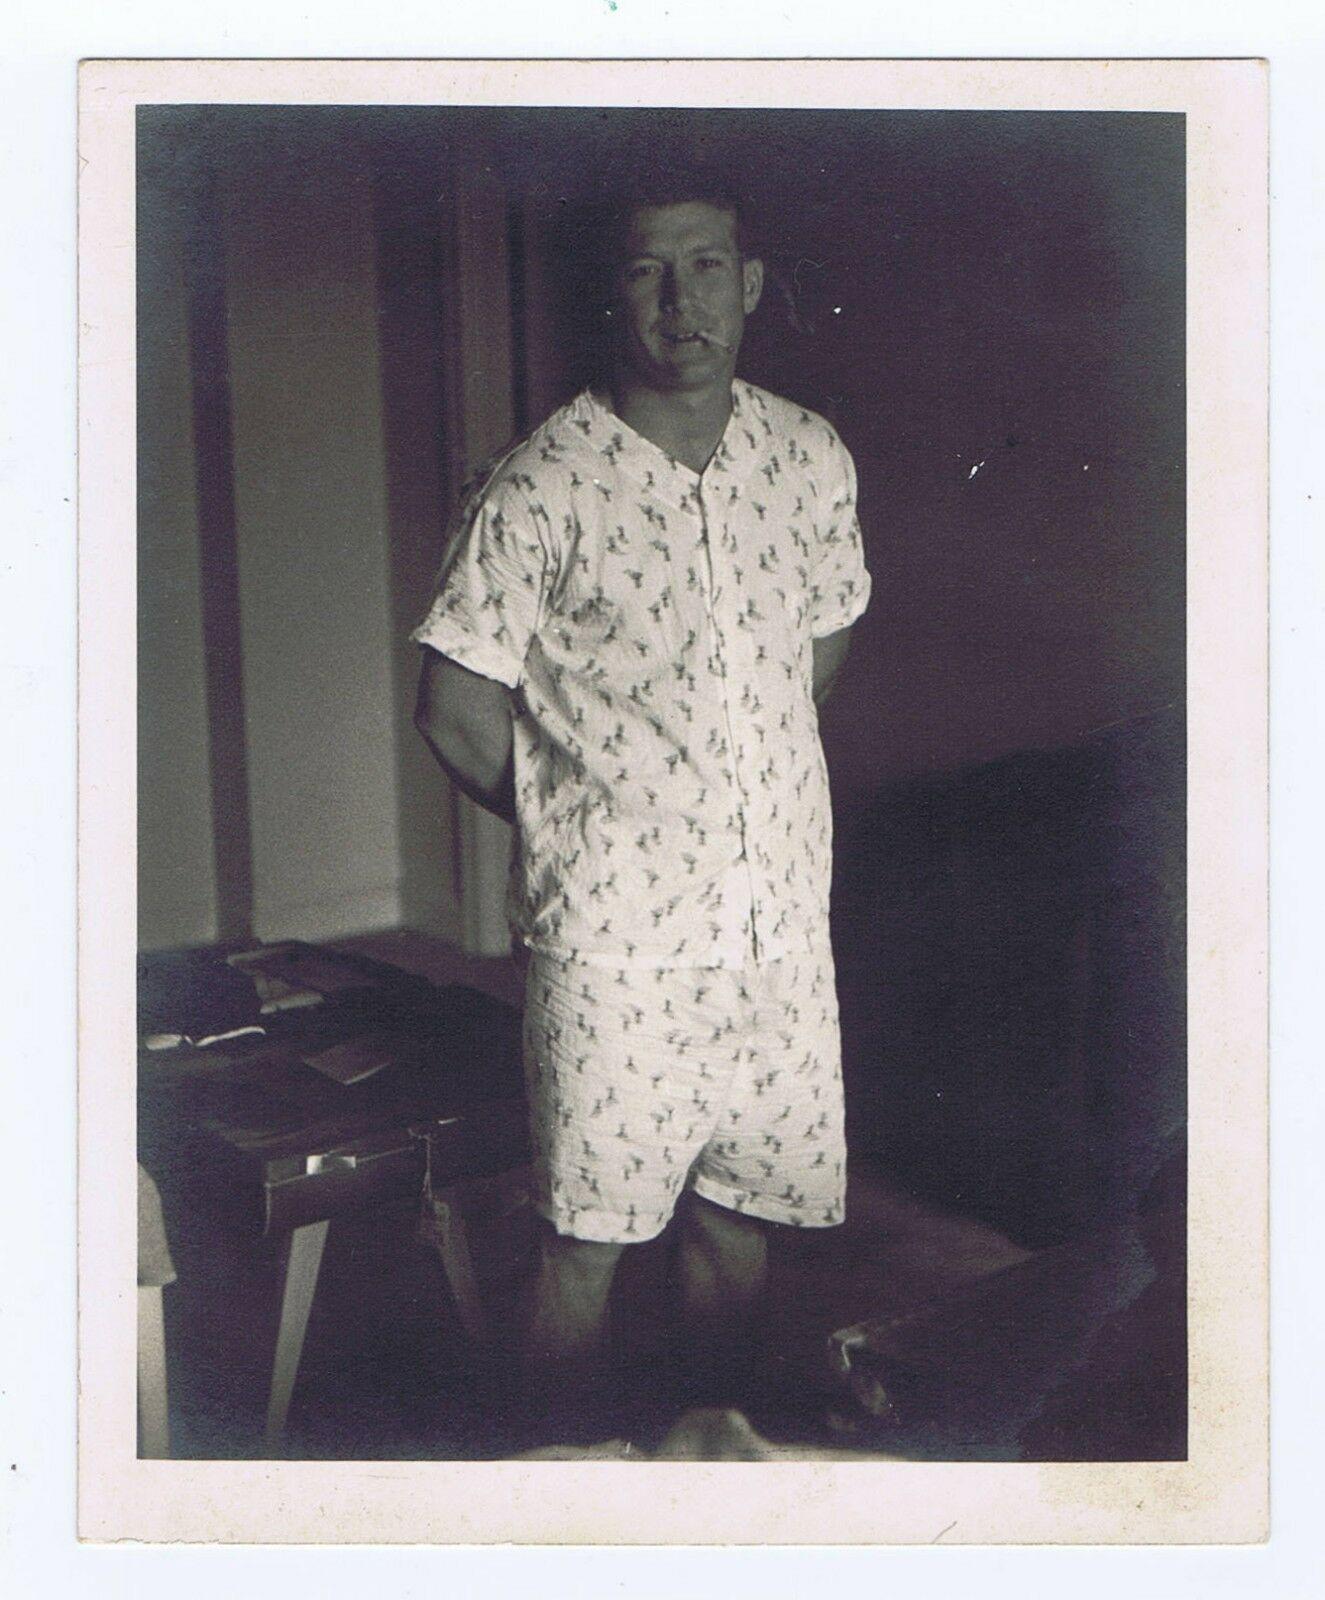 Mickey Mantle 4×5  Photo Smoking Pajamas Type 1 PSA DNA coa 1950's 1/1 RARE